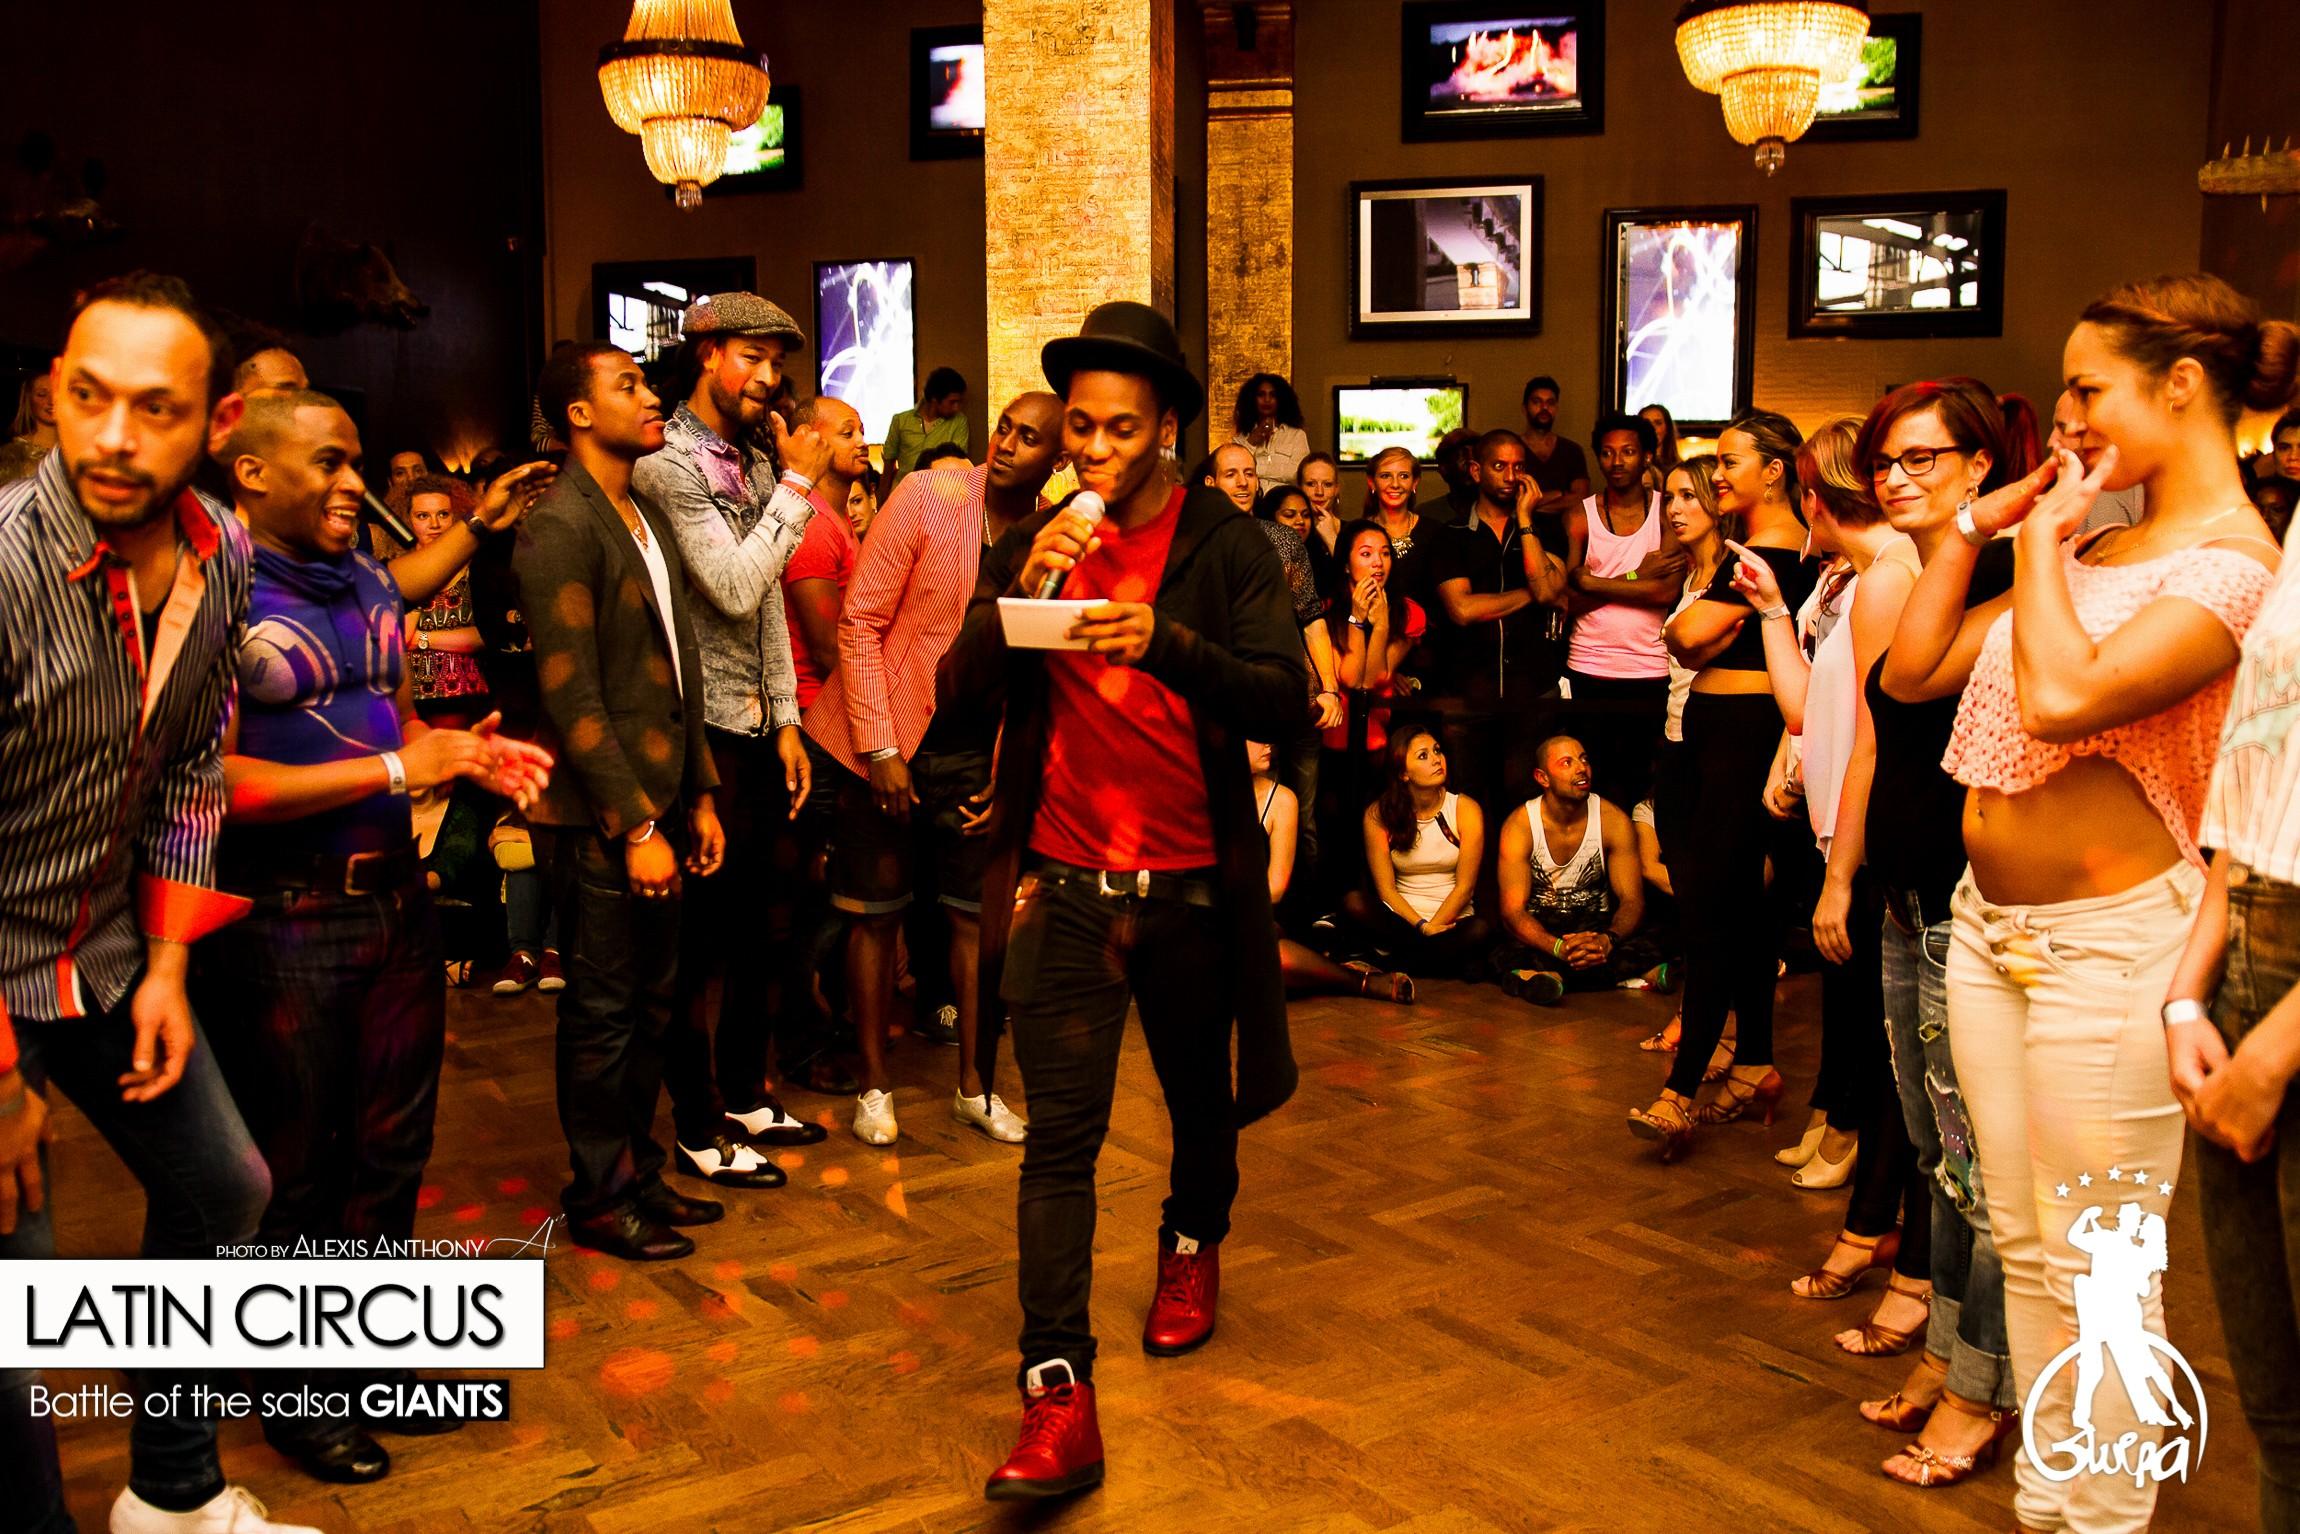 Latin Circus Battle of the Salsa Giants || 11 Oct 2015